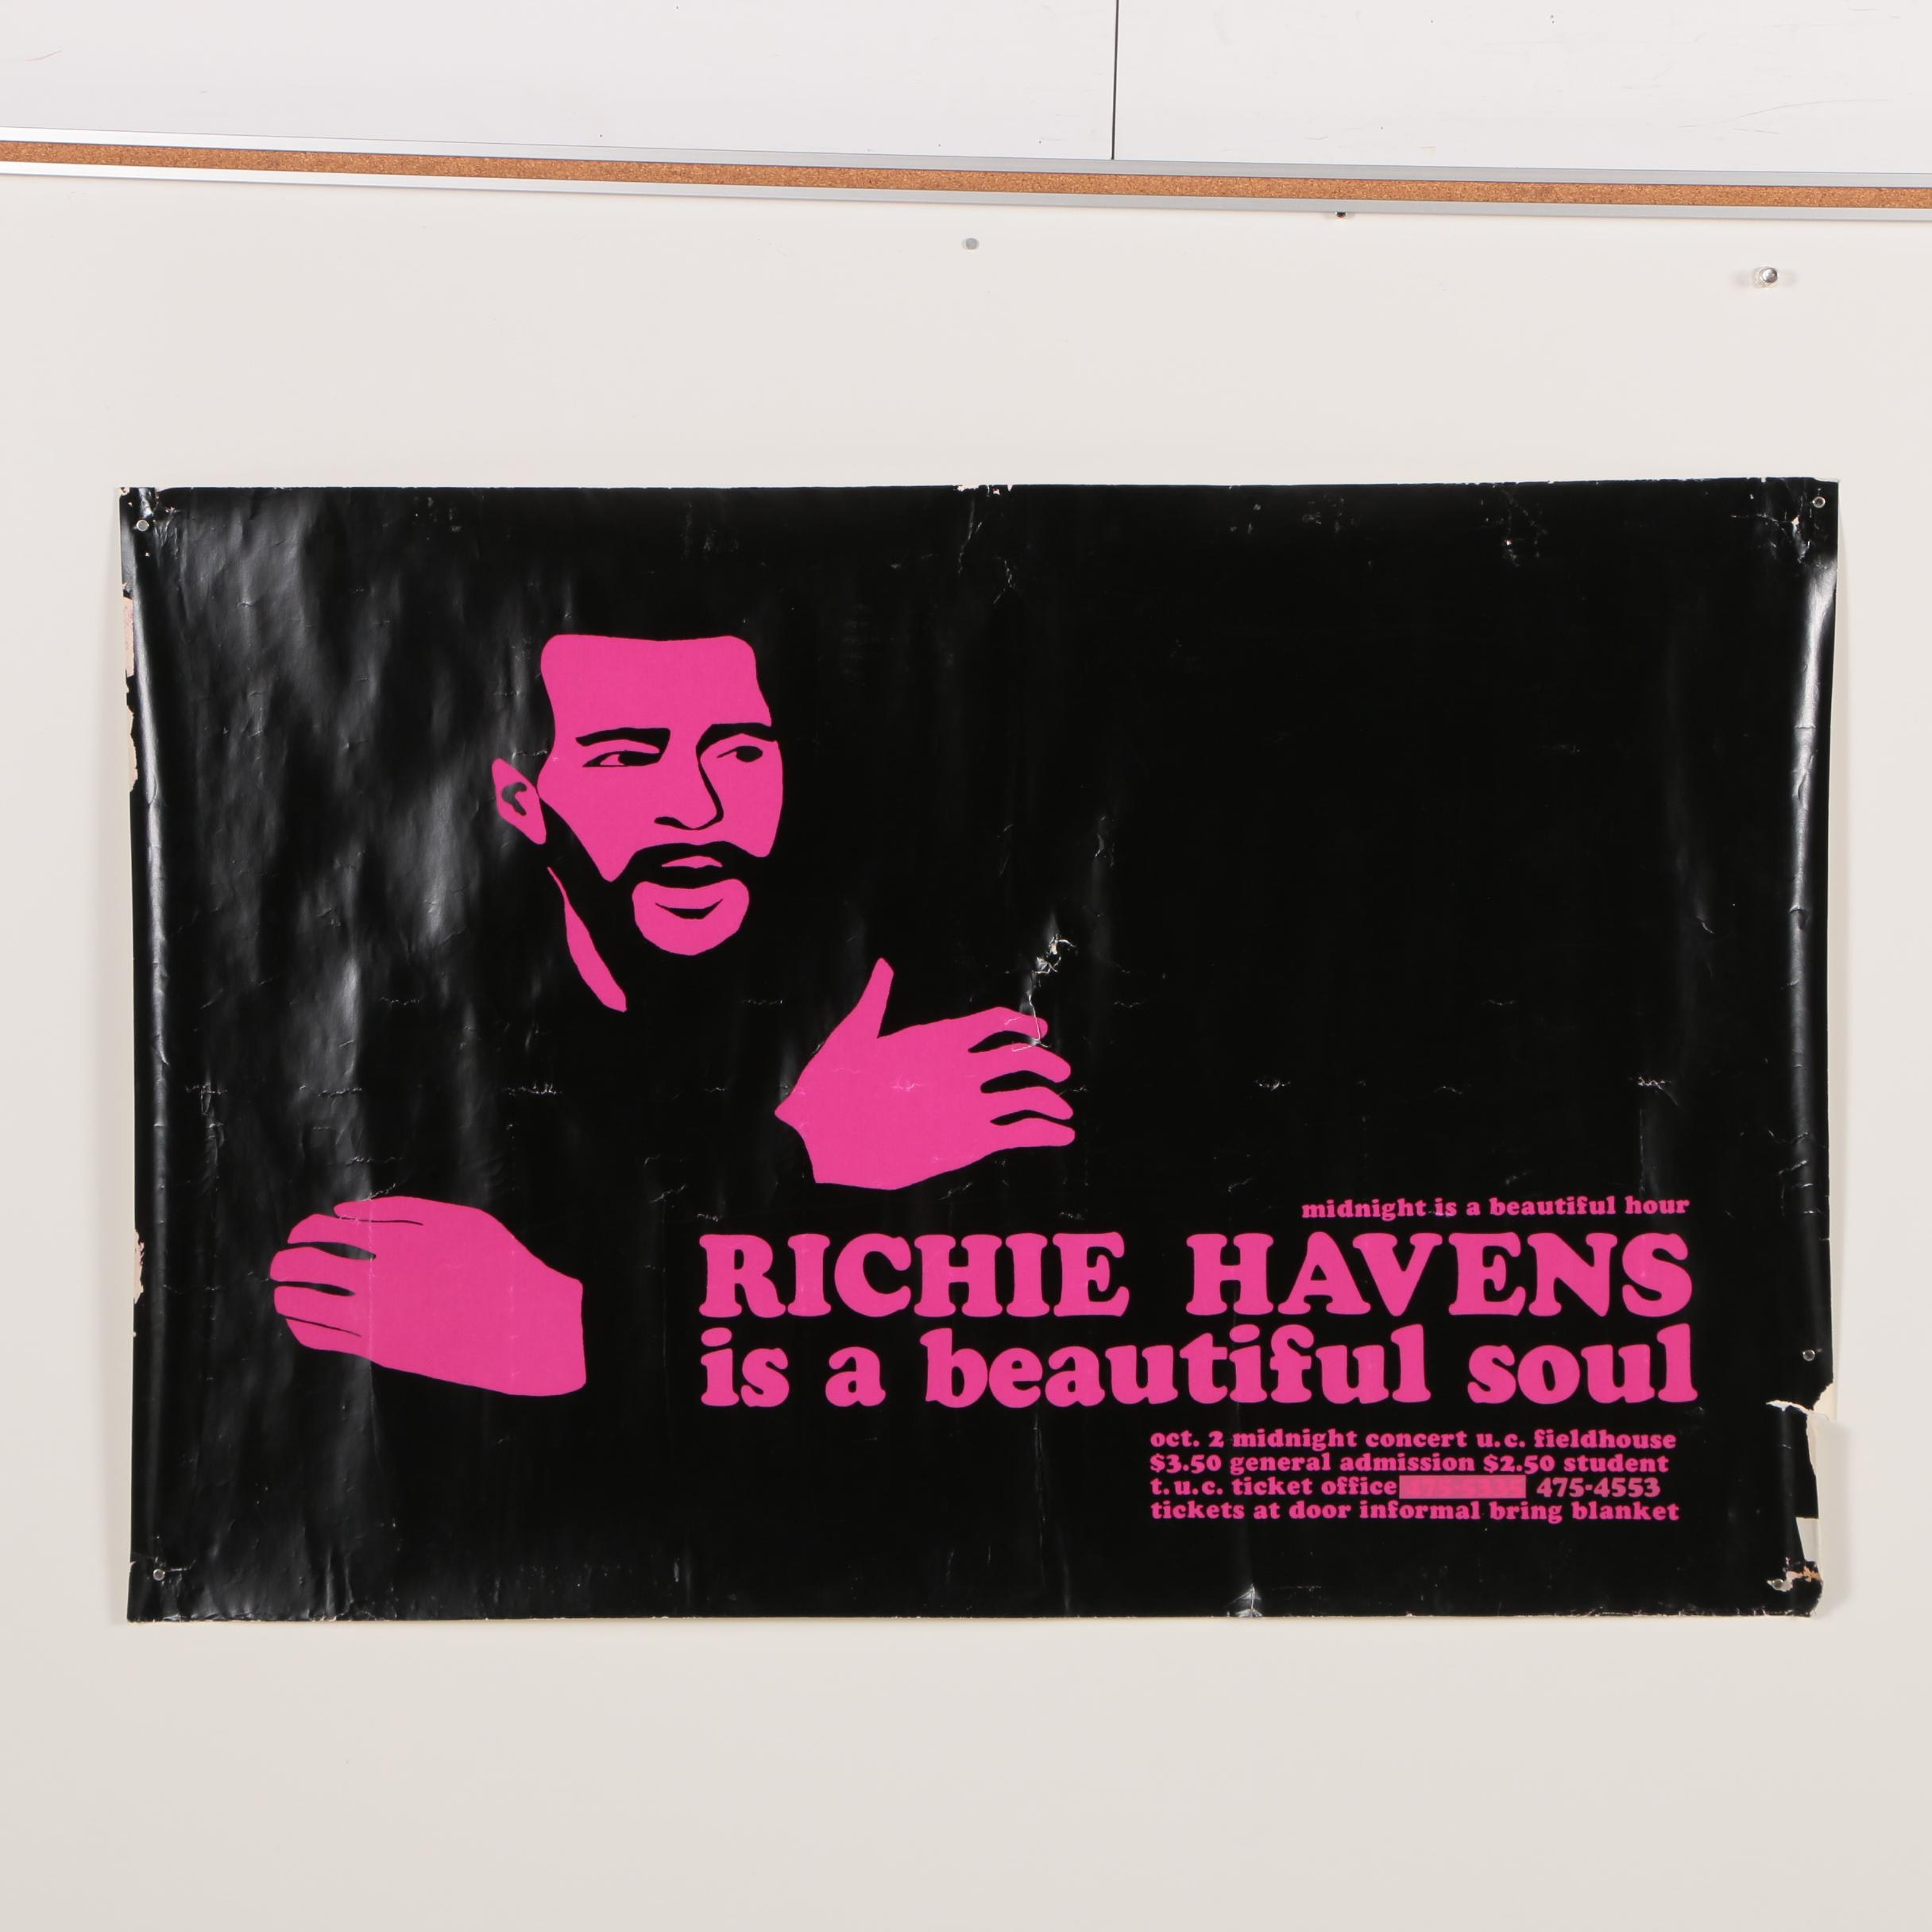 Richie Havens Concert Poster